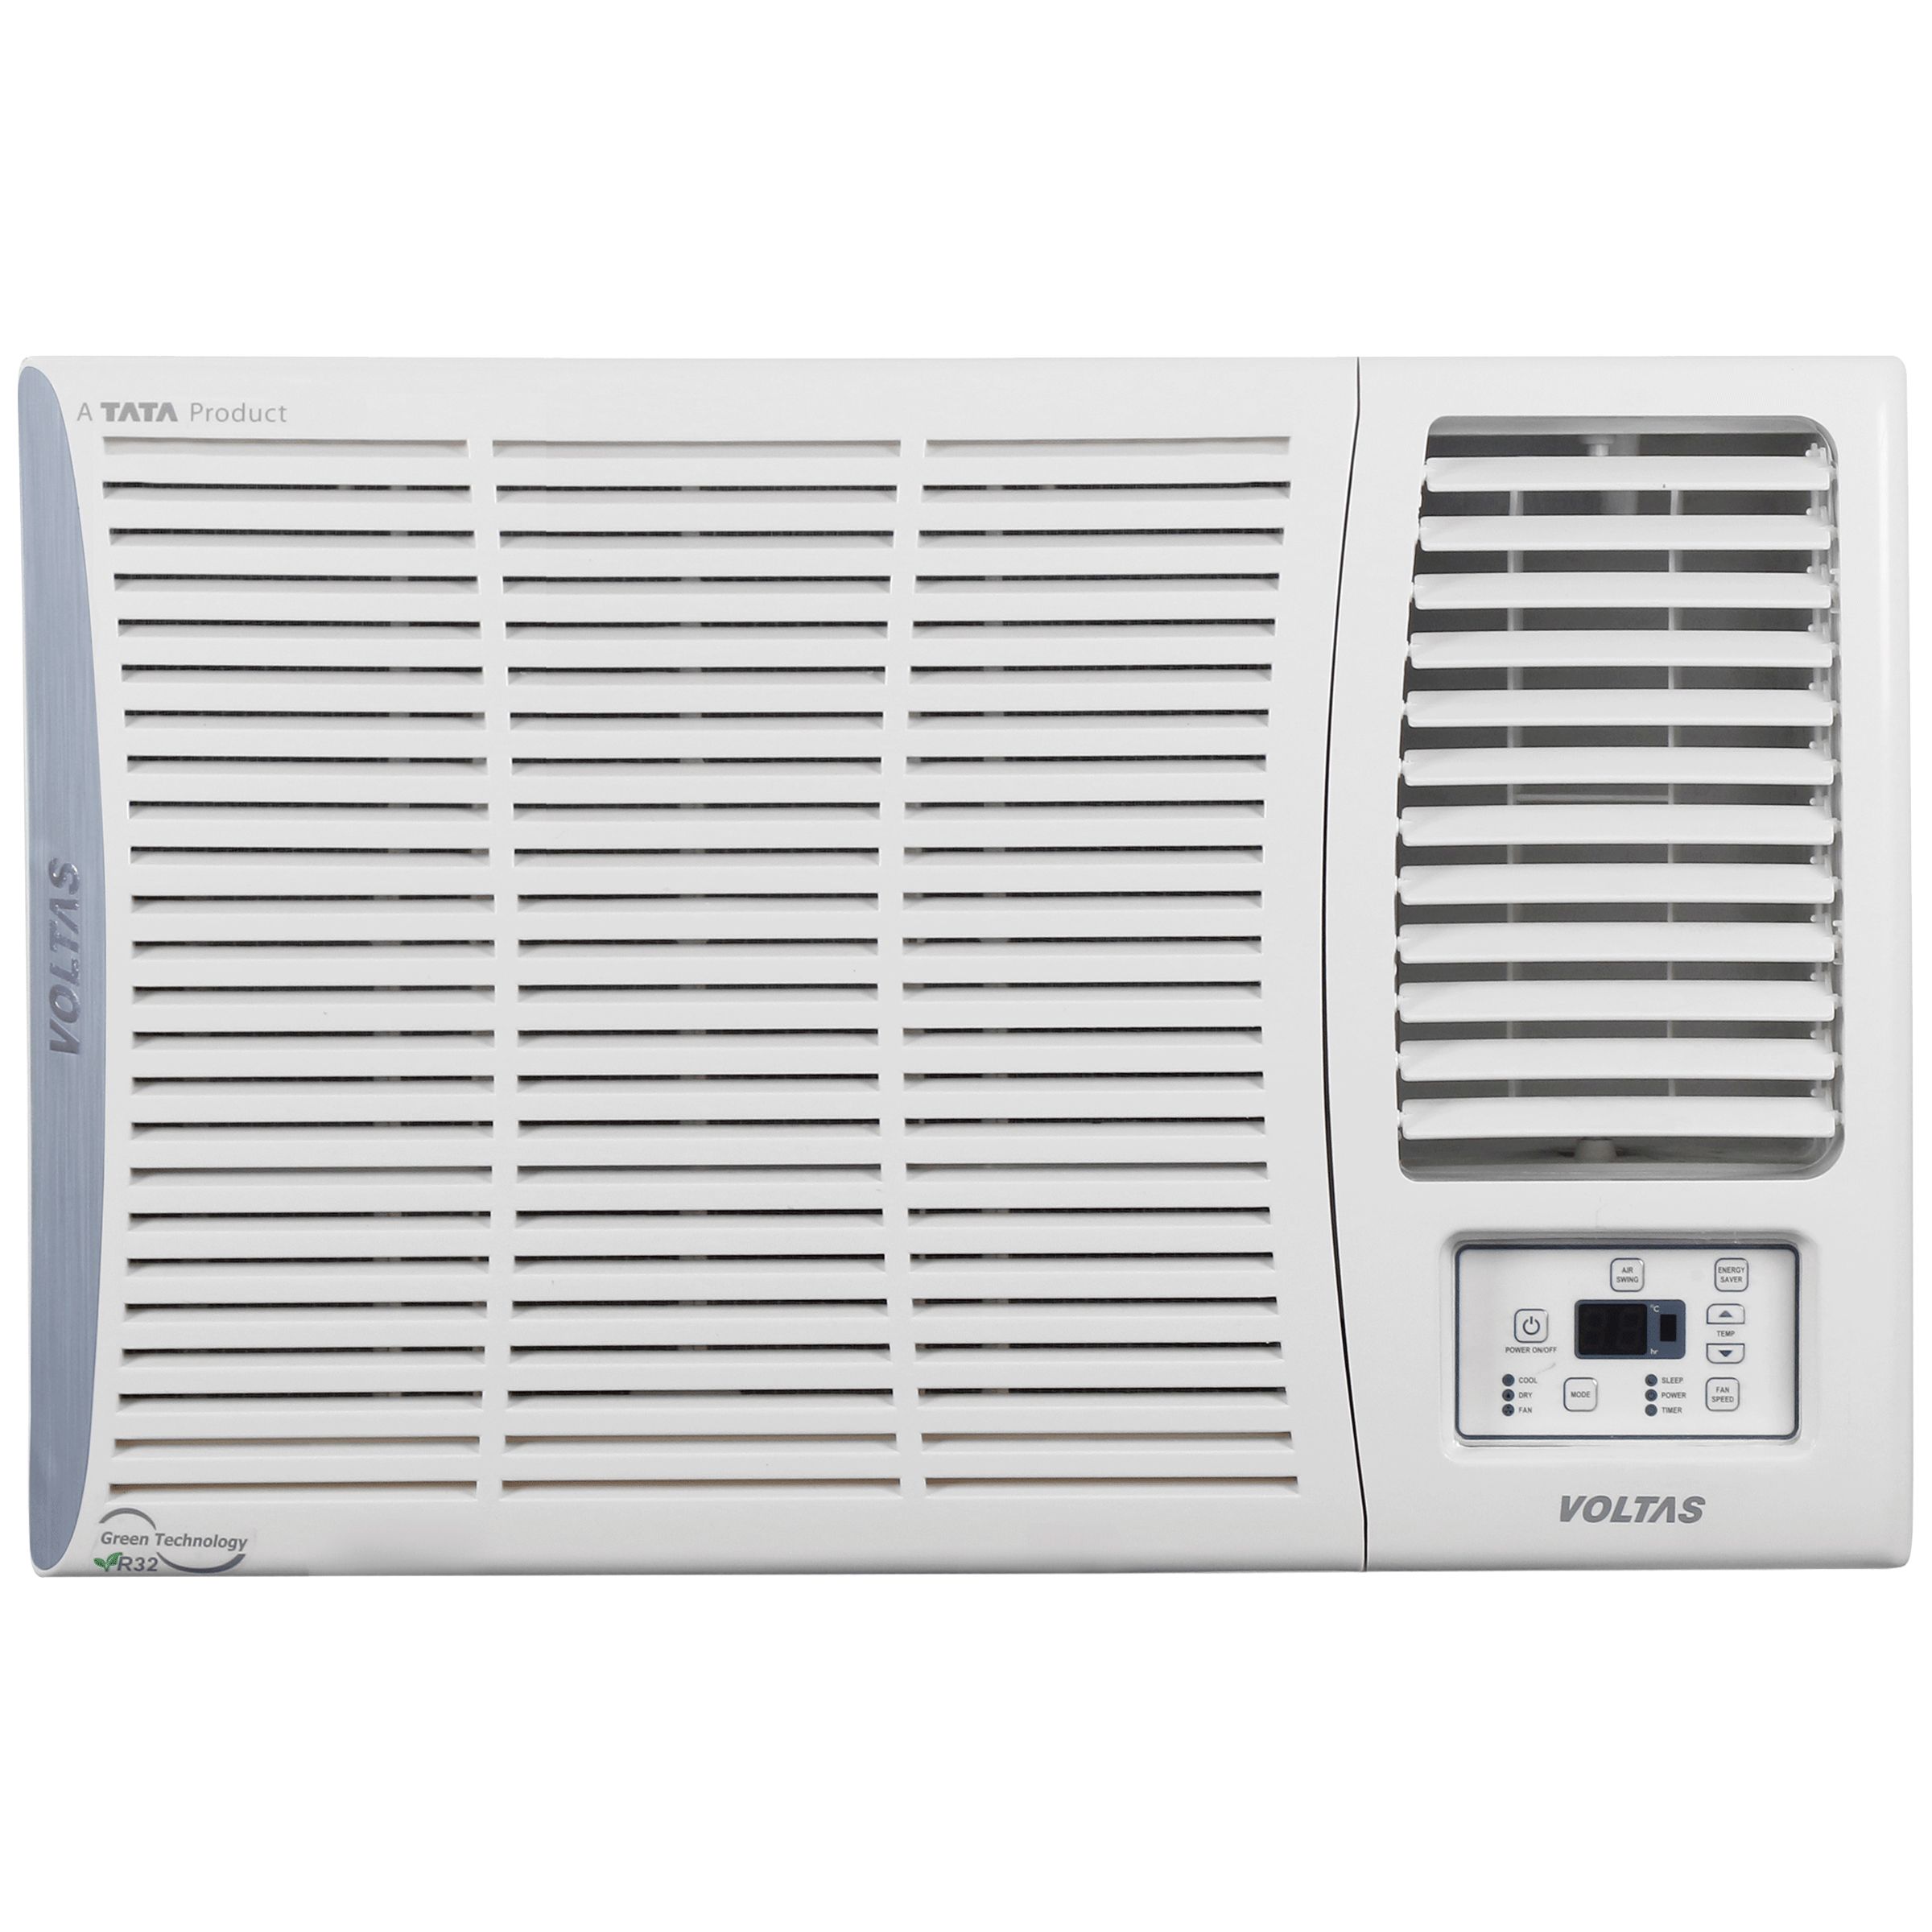 Voltas 173V ADA 1.4 Ton 3 Star Inverter Window AC (Copper Condenser, WAC 173V AD, White)_1